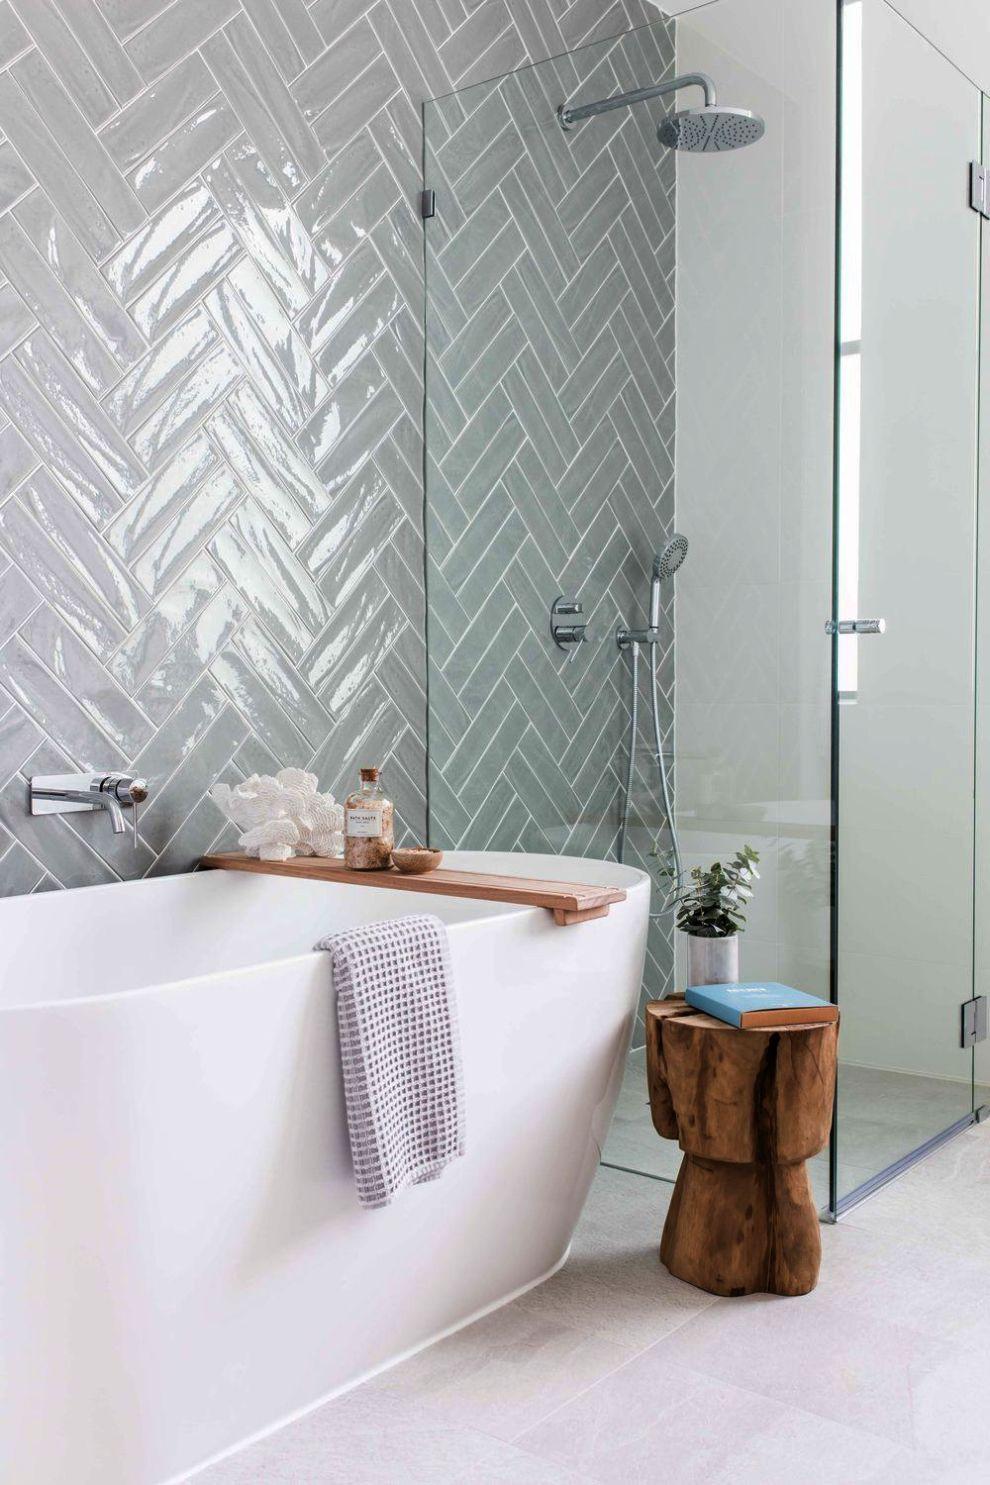 Beau Decorations For Bathrooms Walls Designing A Bathroom Online Free